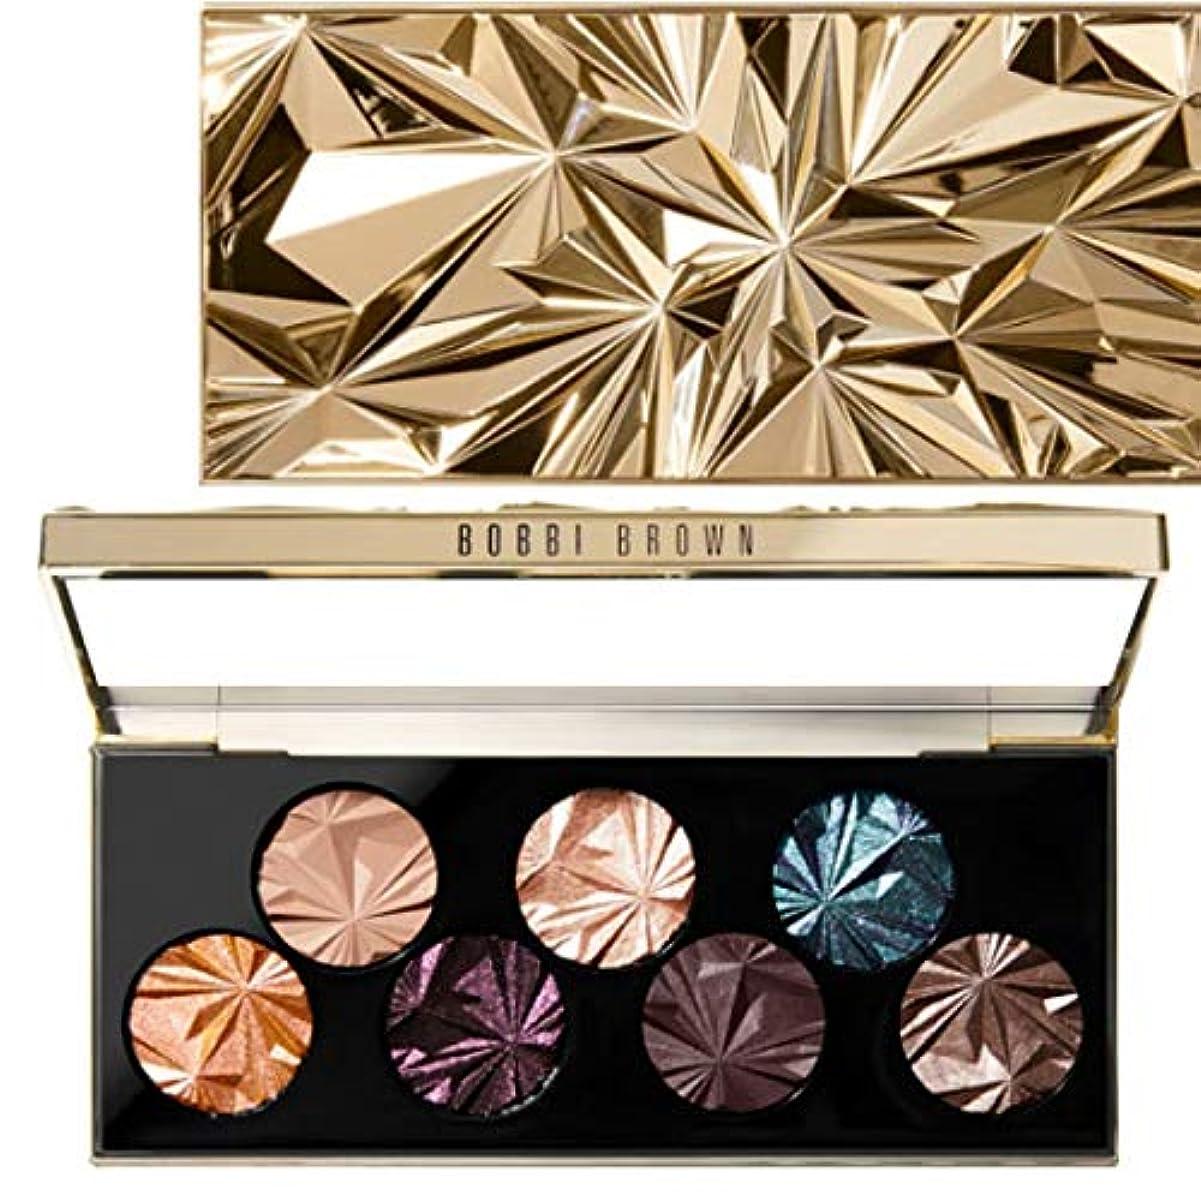 経度金銭的セールBobbi Brown,limited-edition 限定版, Luxe Gems Eyeshadow Palette [海外直送品] [並行輸入品]